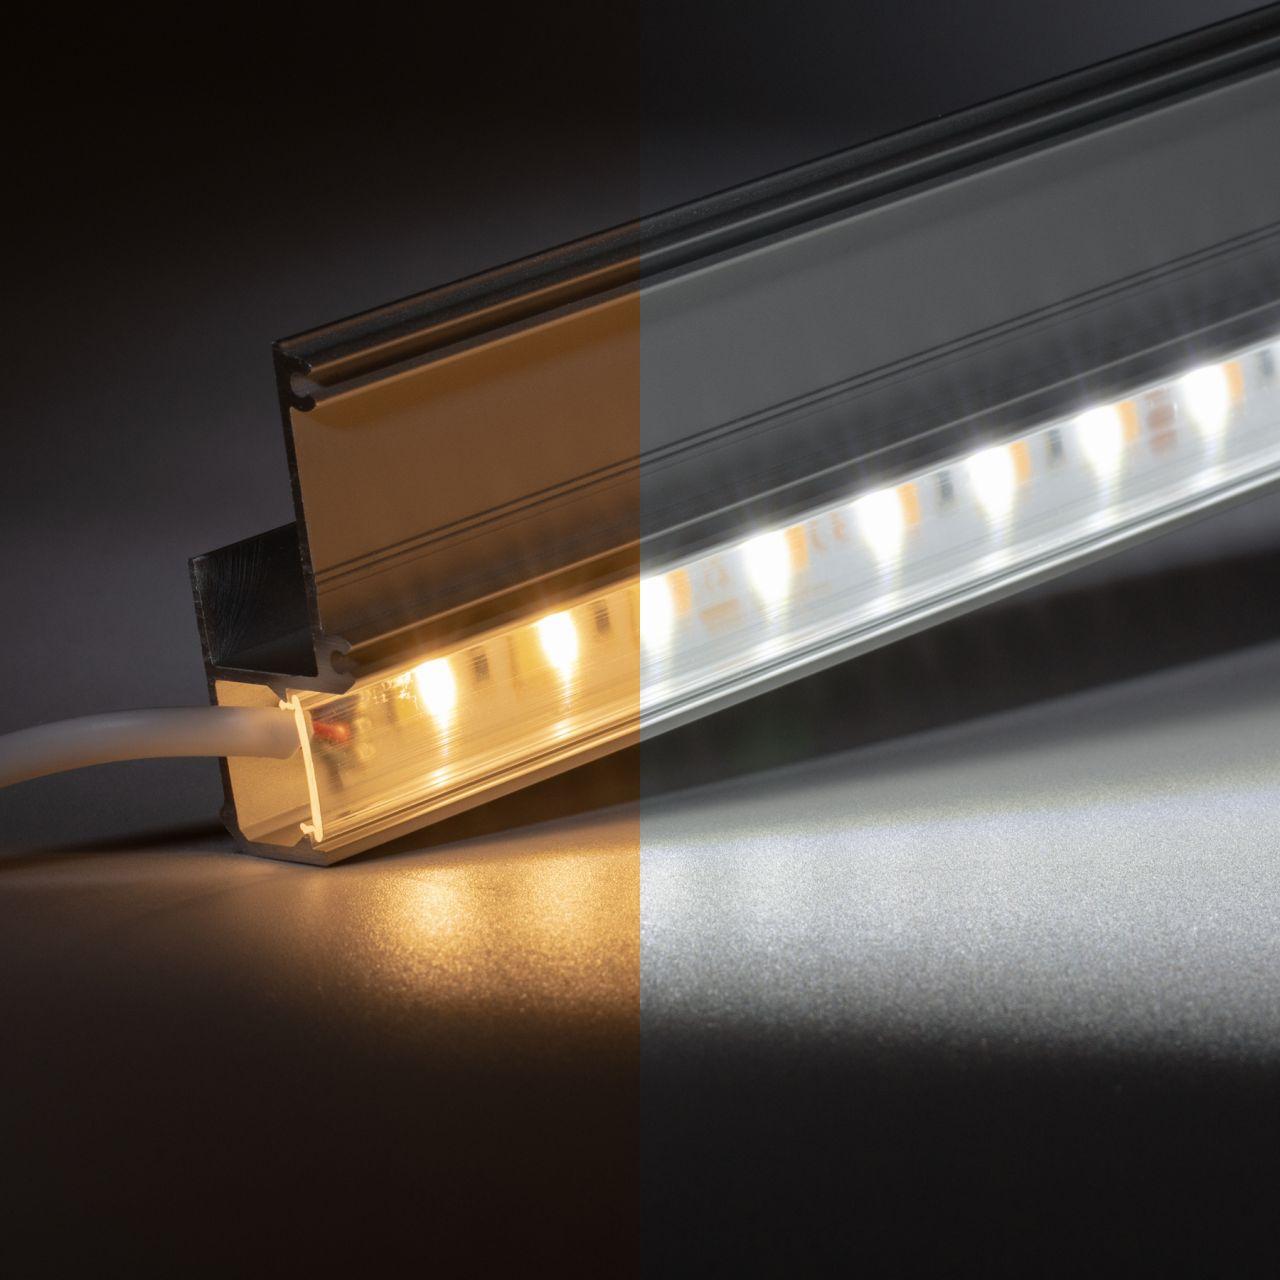 24V Aluminium Trockenbau Abschluss LED Leiste – einstellbare Farbtemperatur – transparente Abdeckung